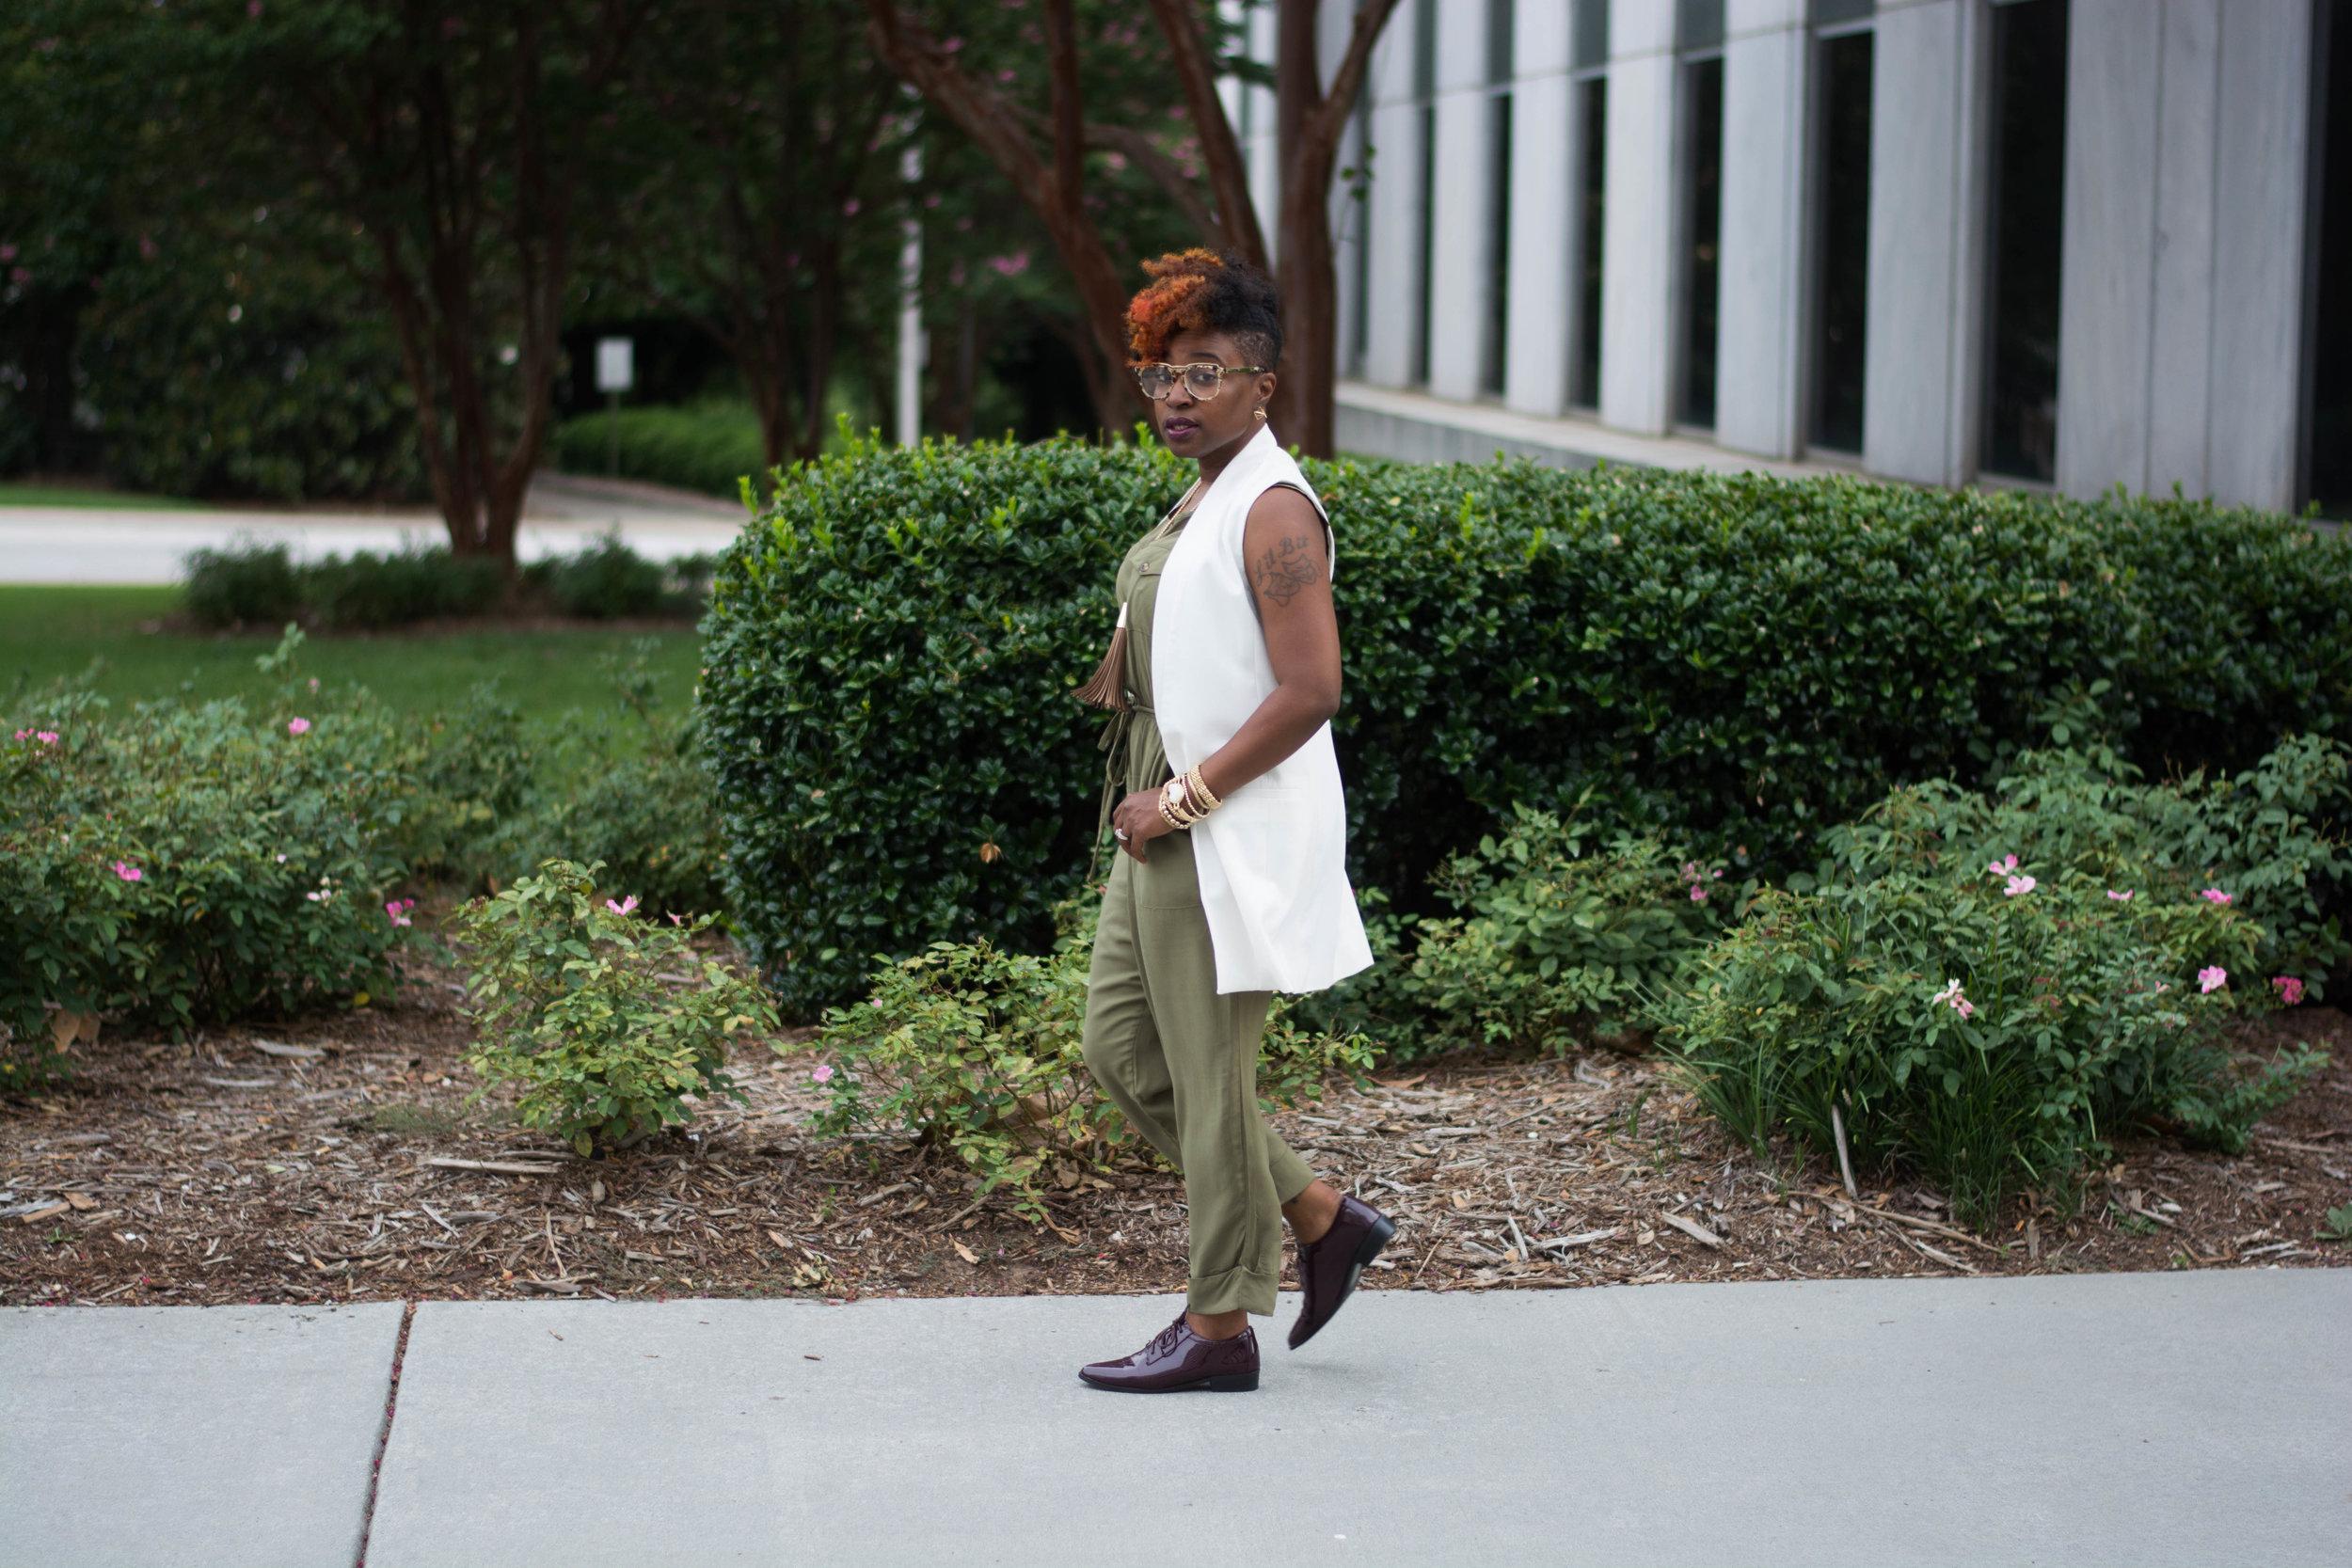 Melodie Stewart, The Style Klazit, Target Vest, Justfab Olive Jumpsuit, Shoedazzle Wine oxfords, Atlanta wardrobe style blogger